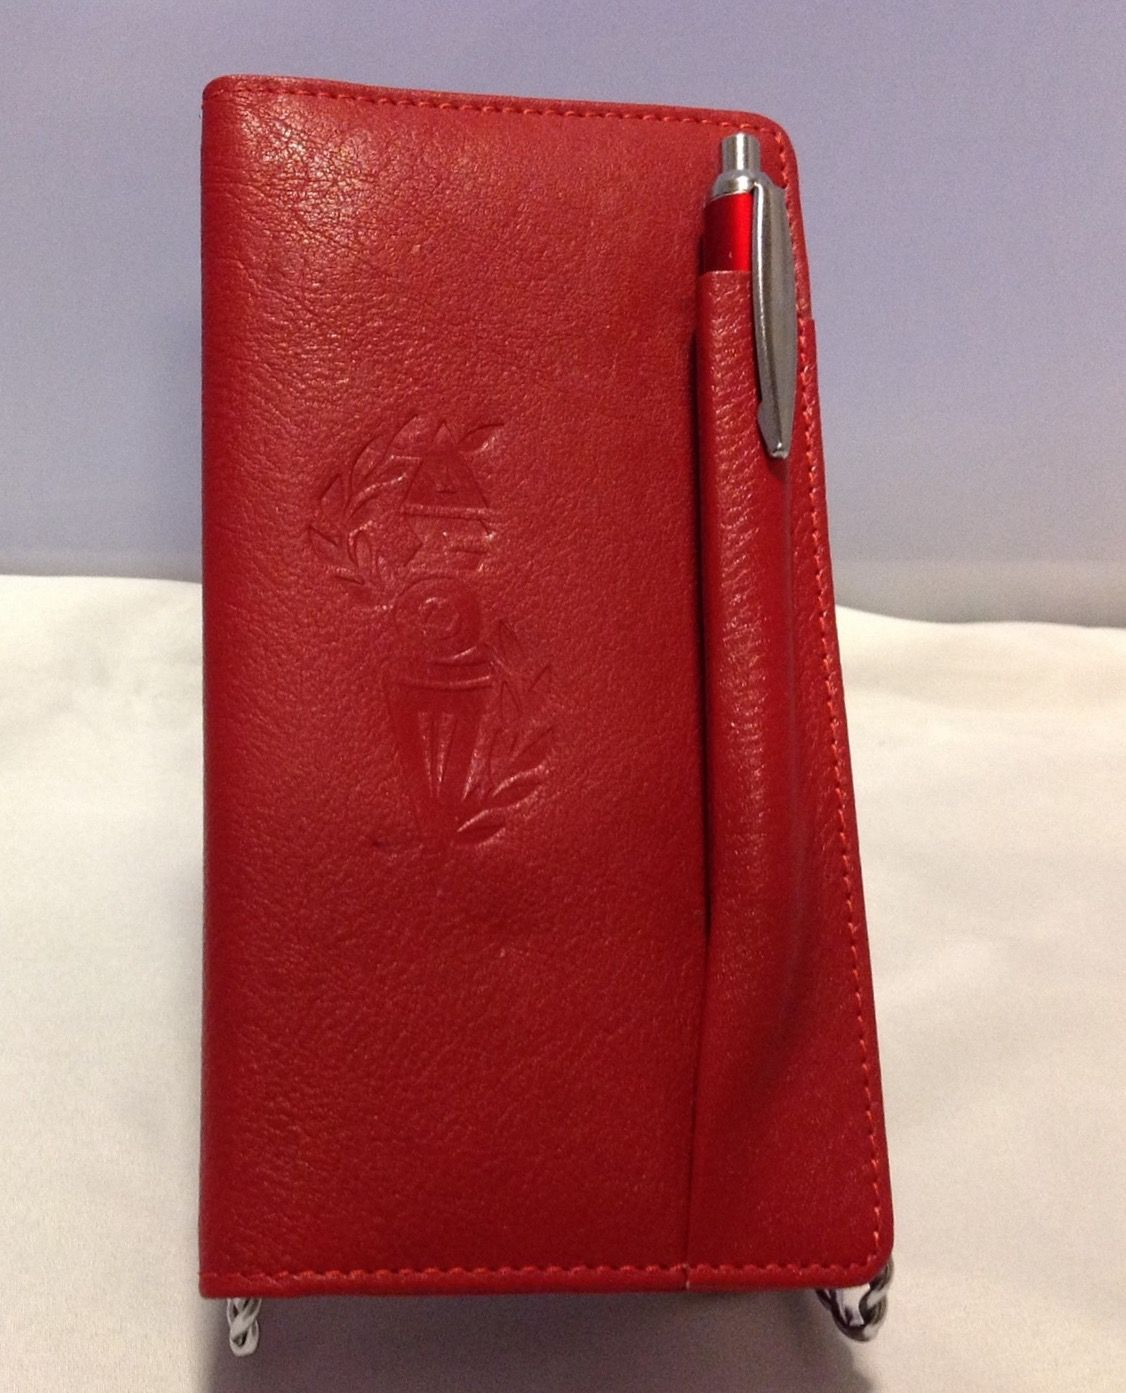 Leather Checkbook Cover | For the Love of Delta Sigma Theta